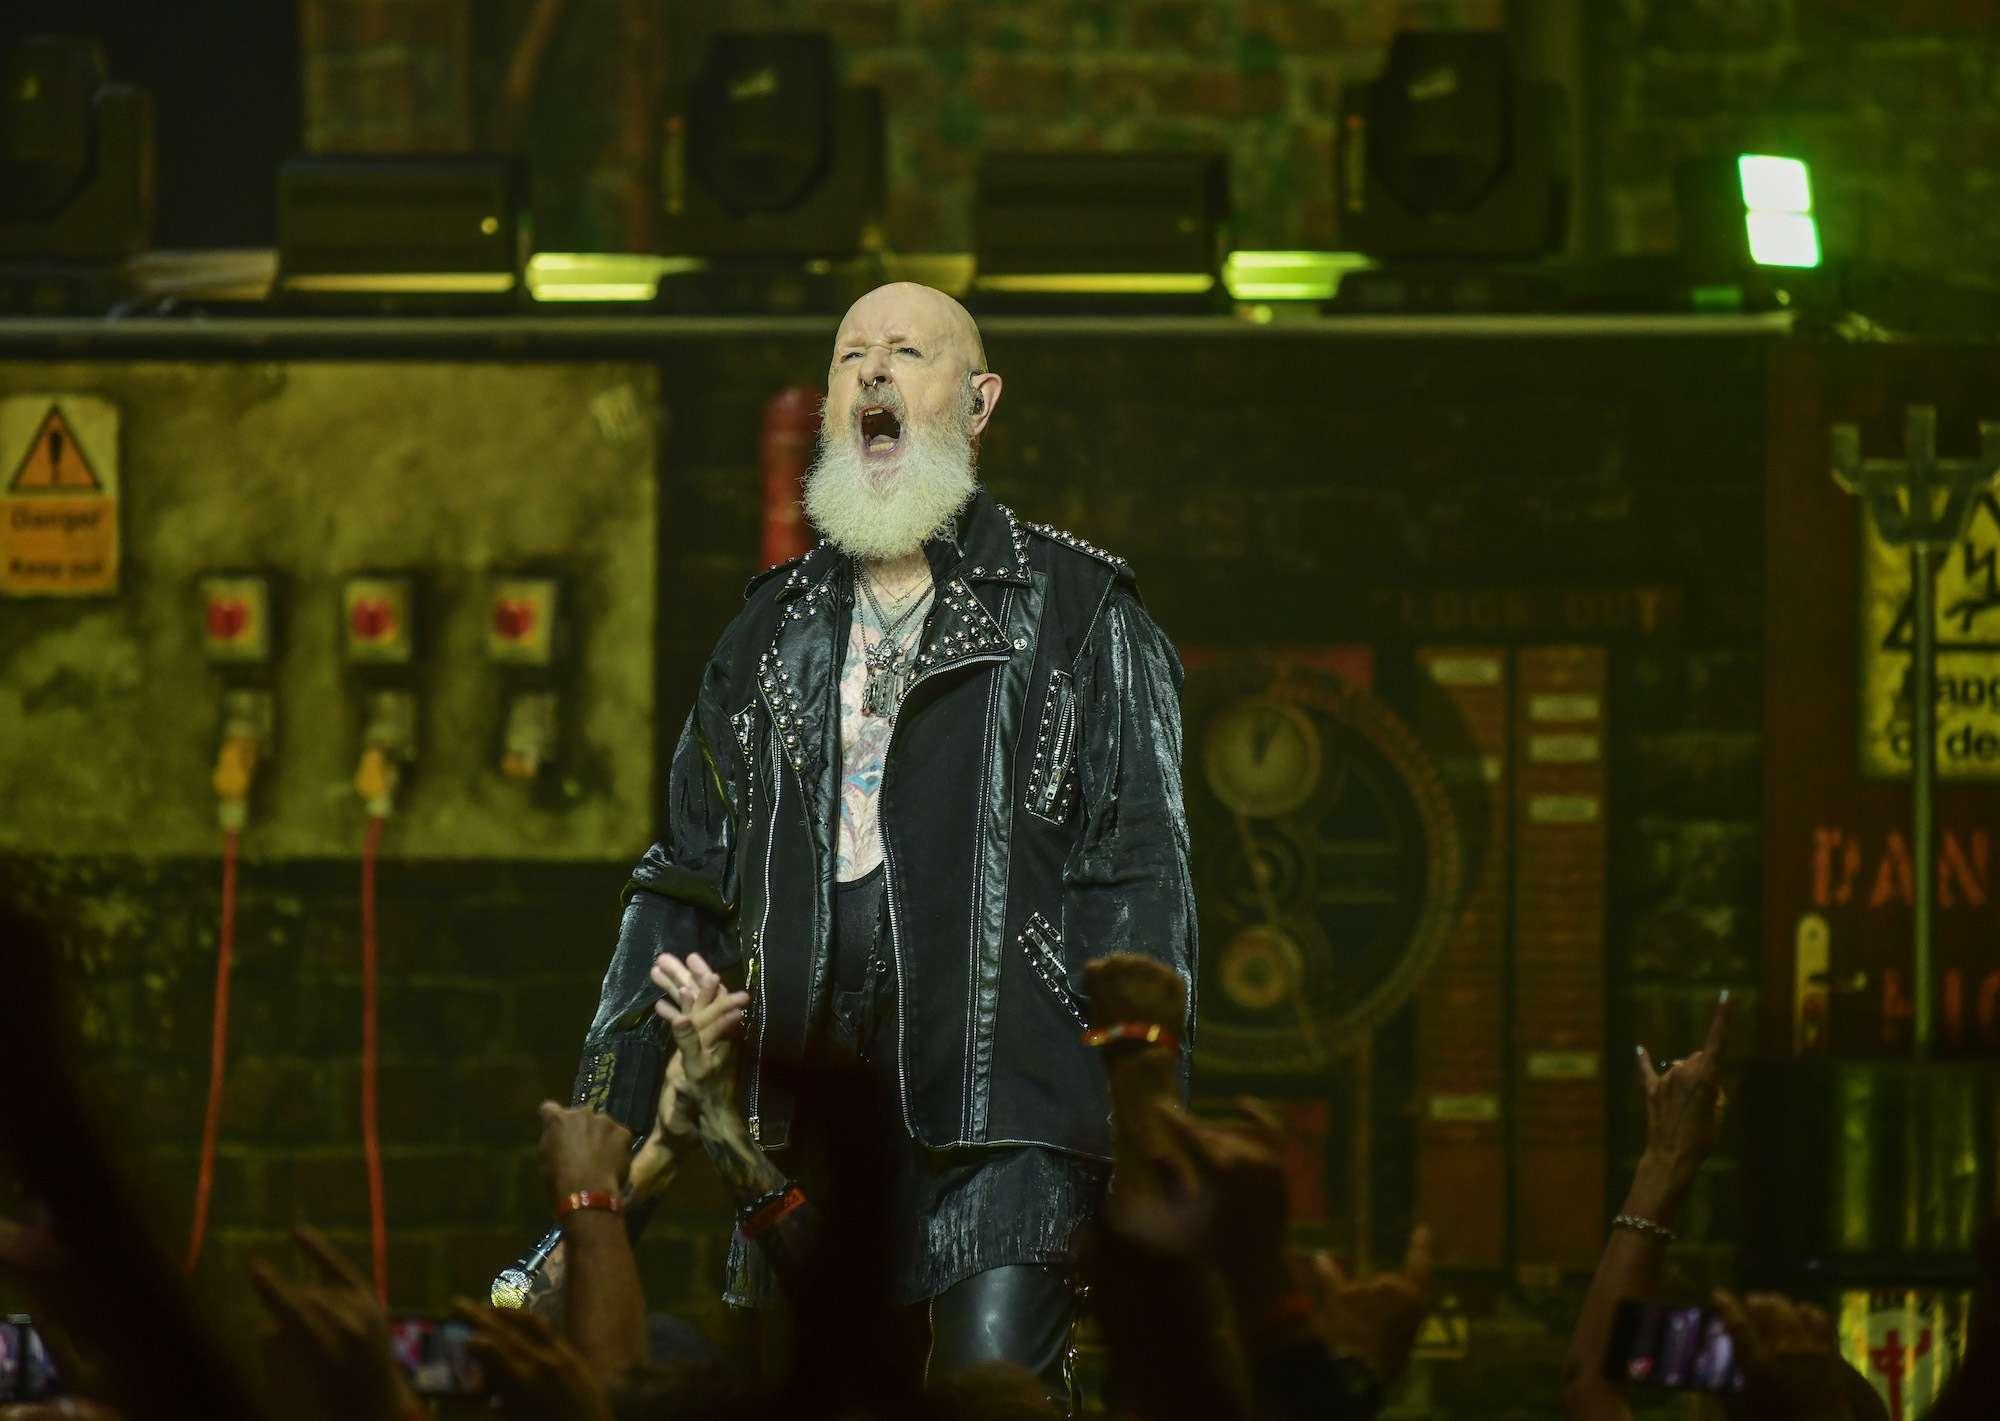 Judas Priest Live at Rosemont Theatre [GALLERY] 7